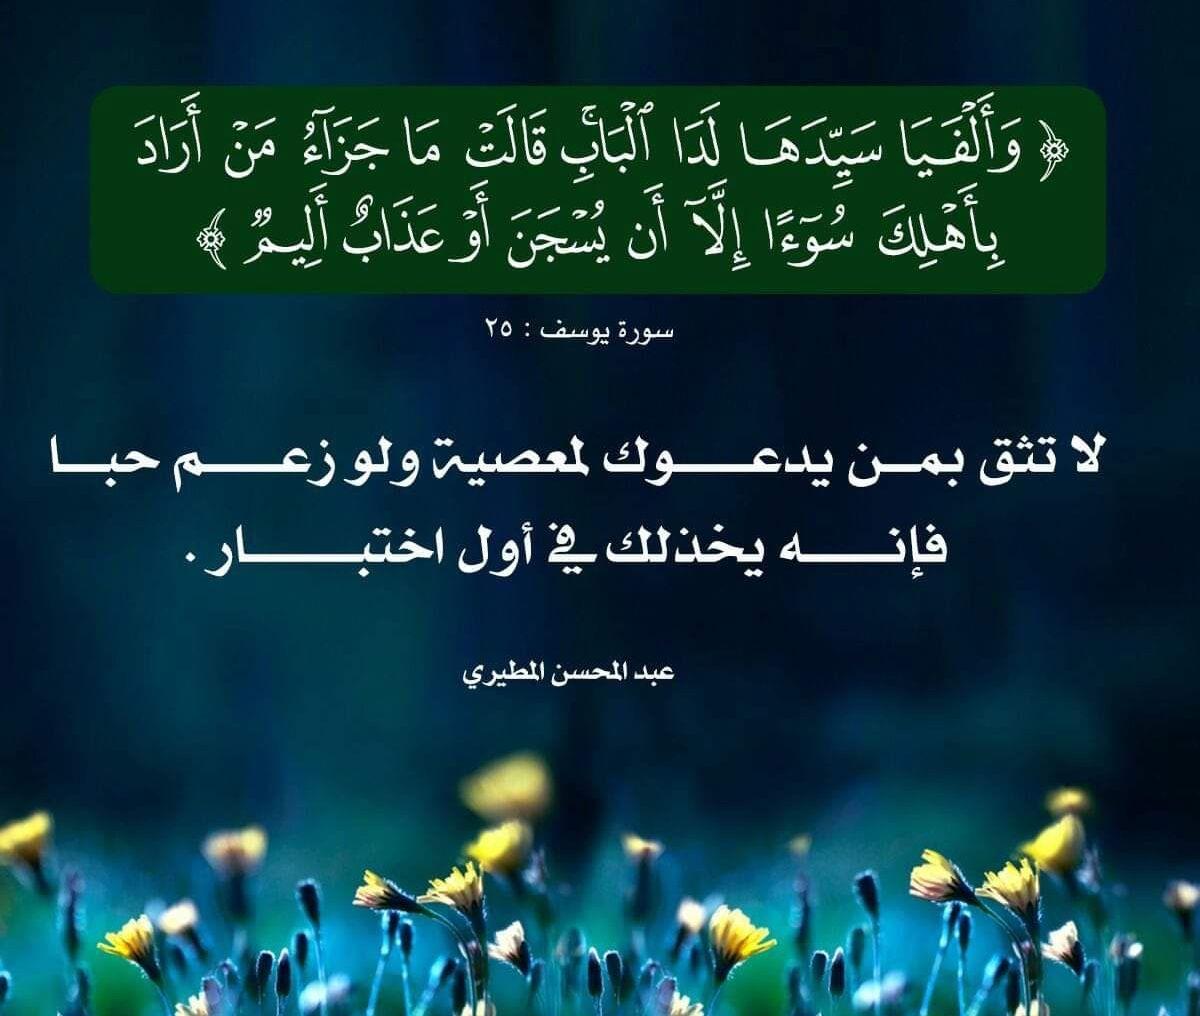 Pin By Nadia On مواعظ خواطر إسلامية Islamic Quotes Quotes Islam